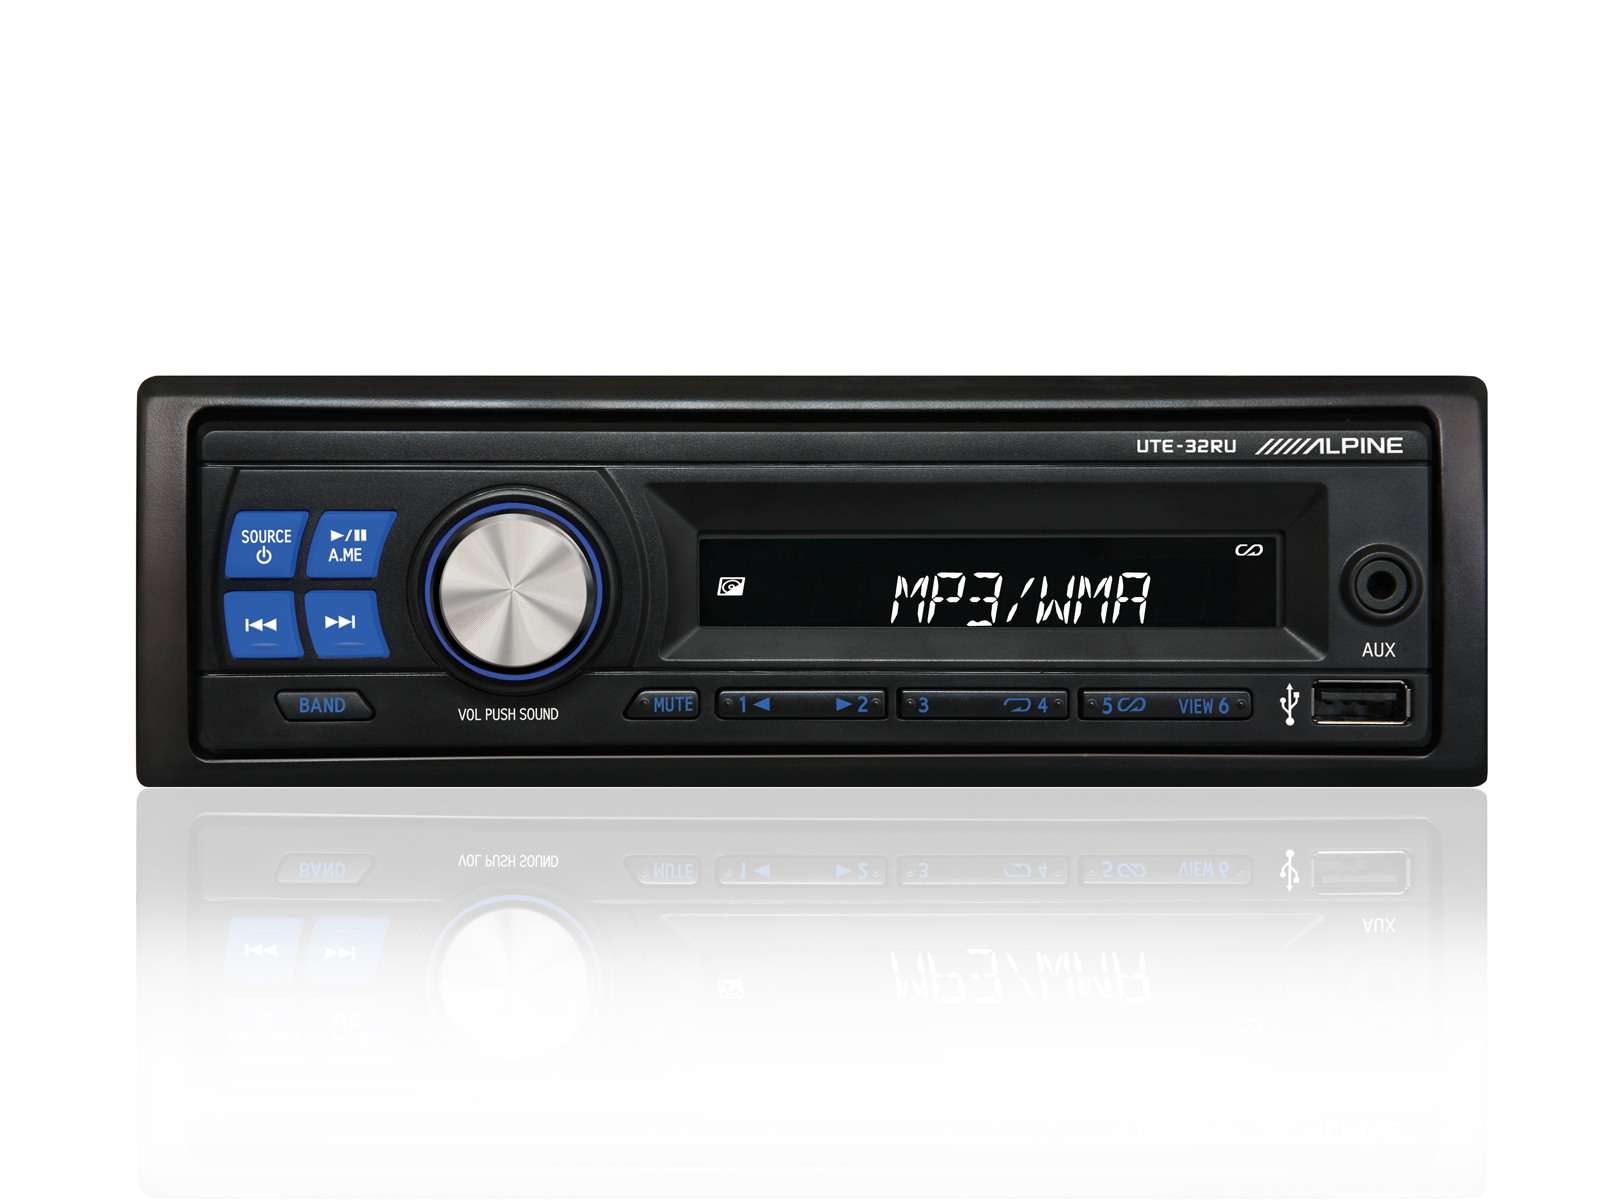 digital media receiver alpine ute 32ru rh alpine electronics co za Alpine Car Stereo CD Player Alpine Car Radio Manual